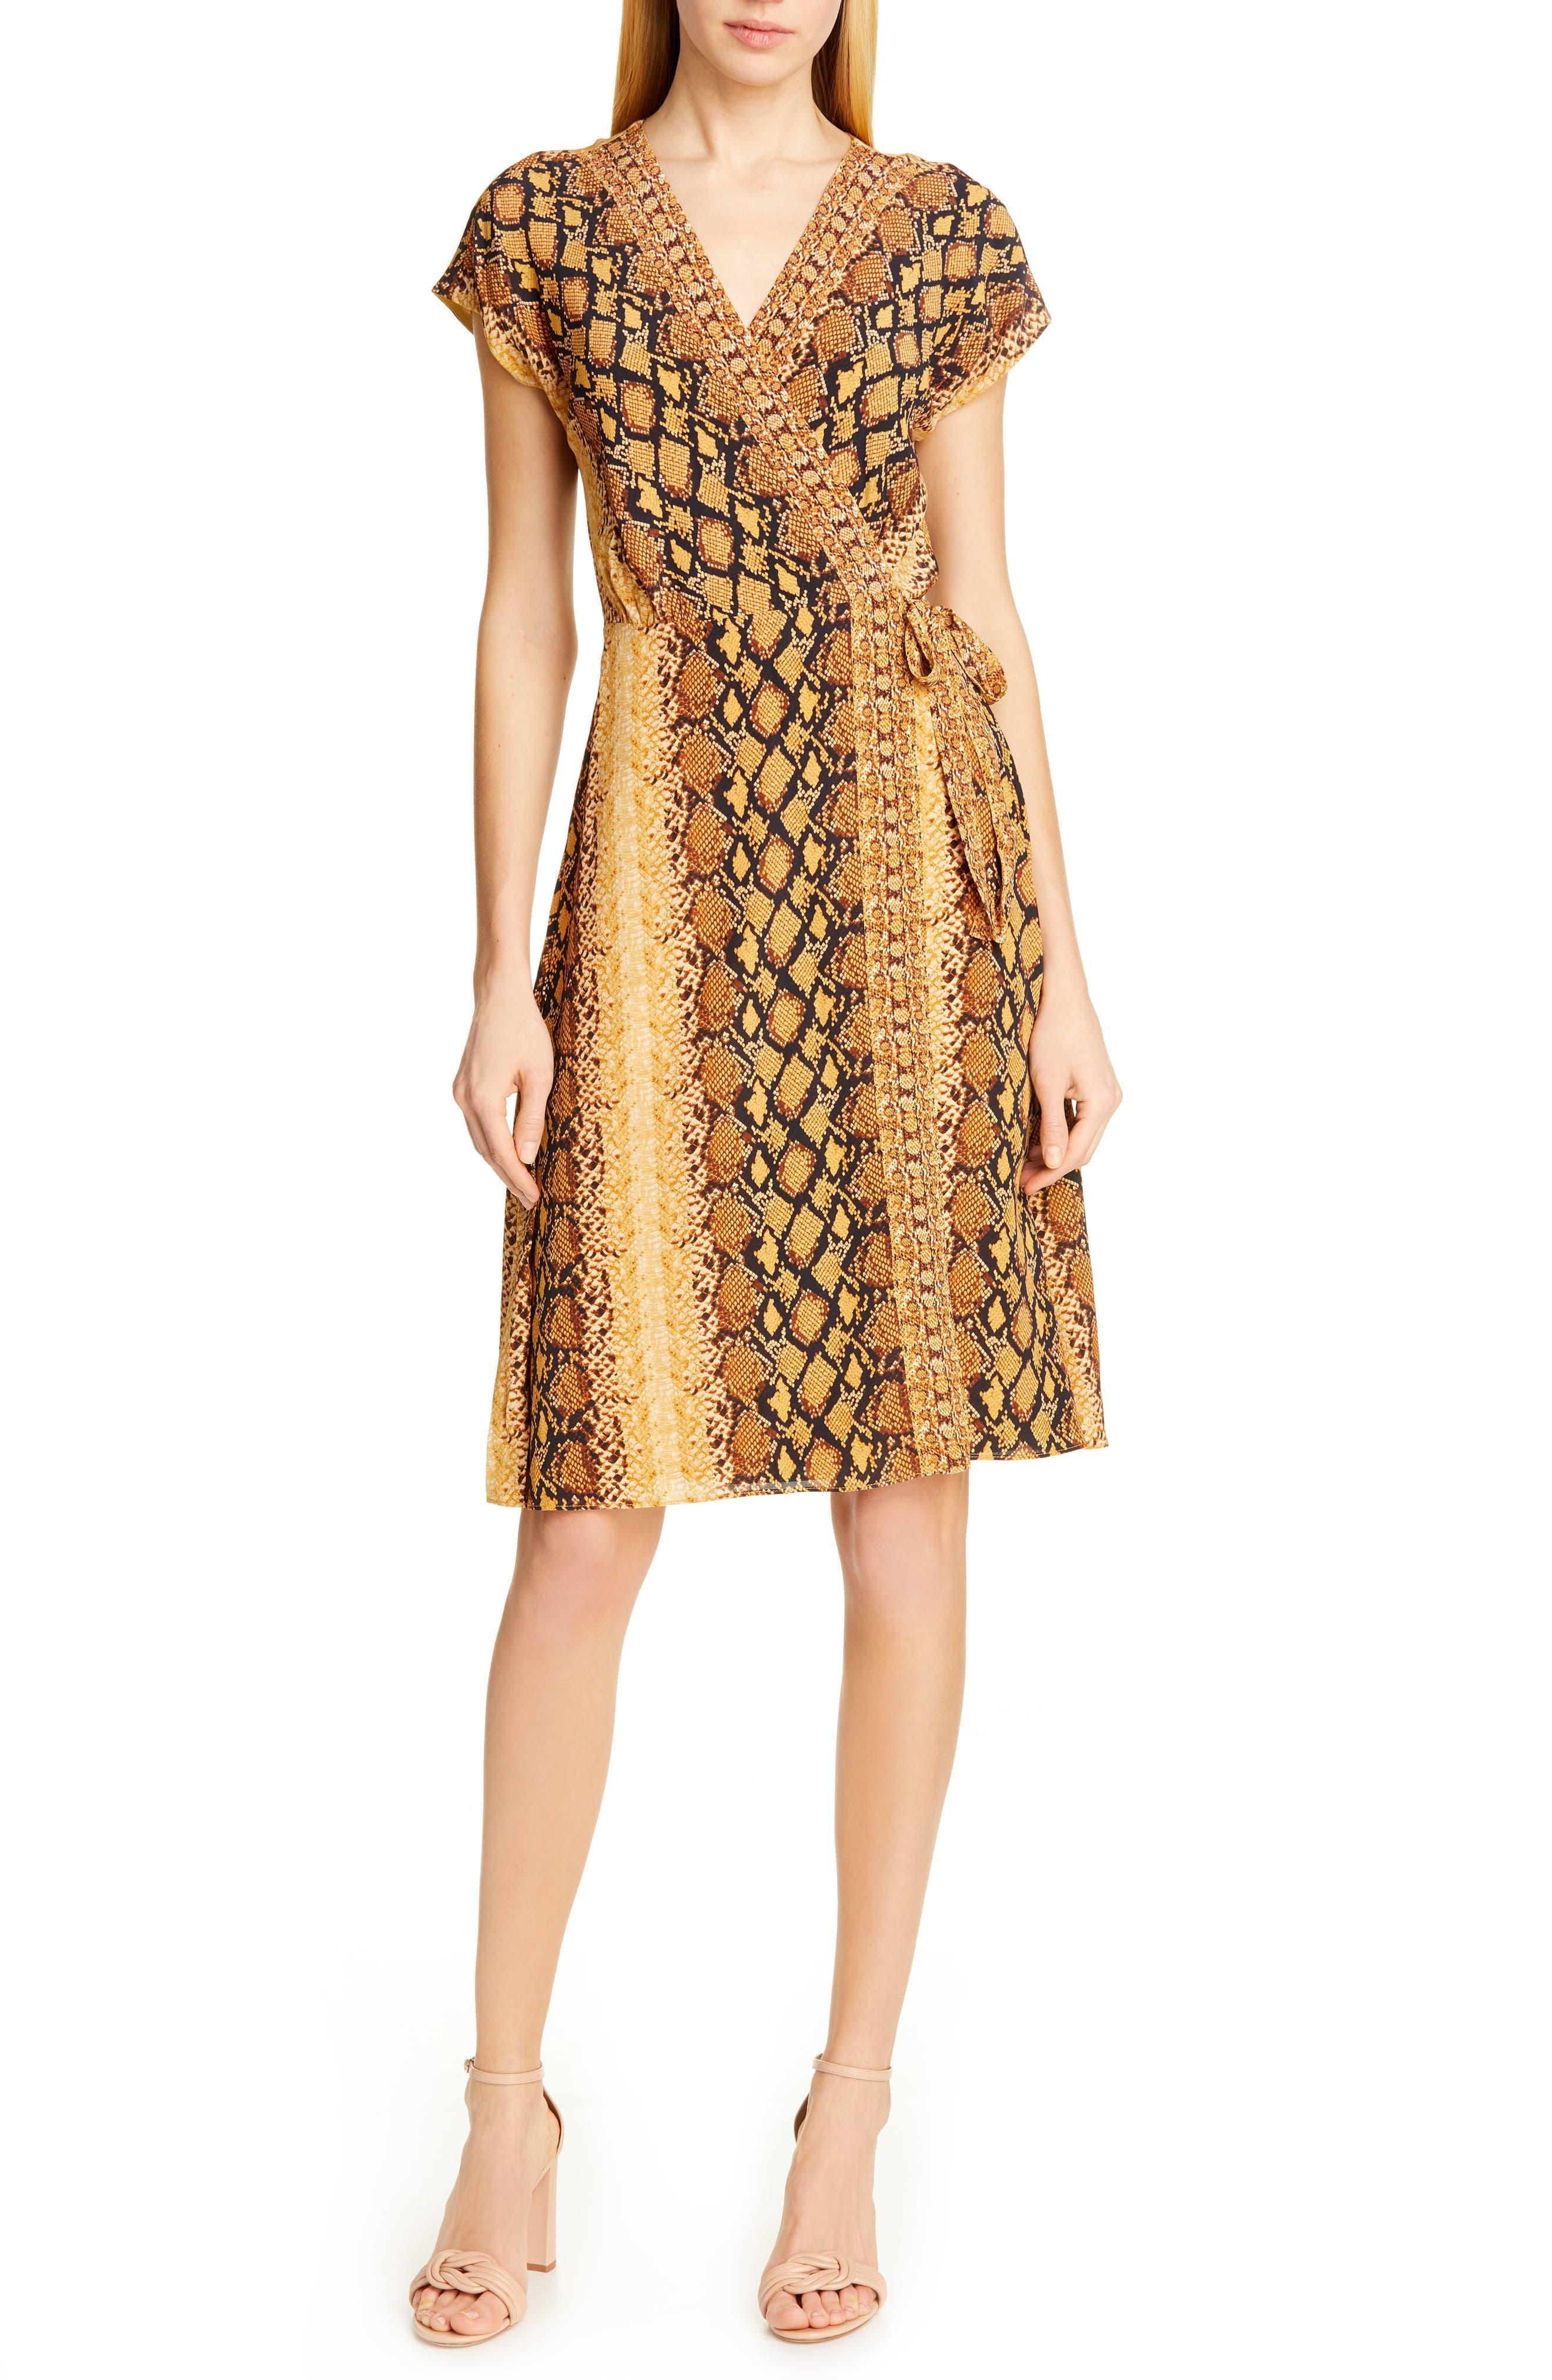 Joie Bethwyn C Snakeskin Print Wrap Style Dress, Yellow